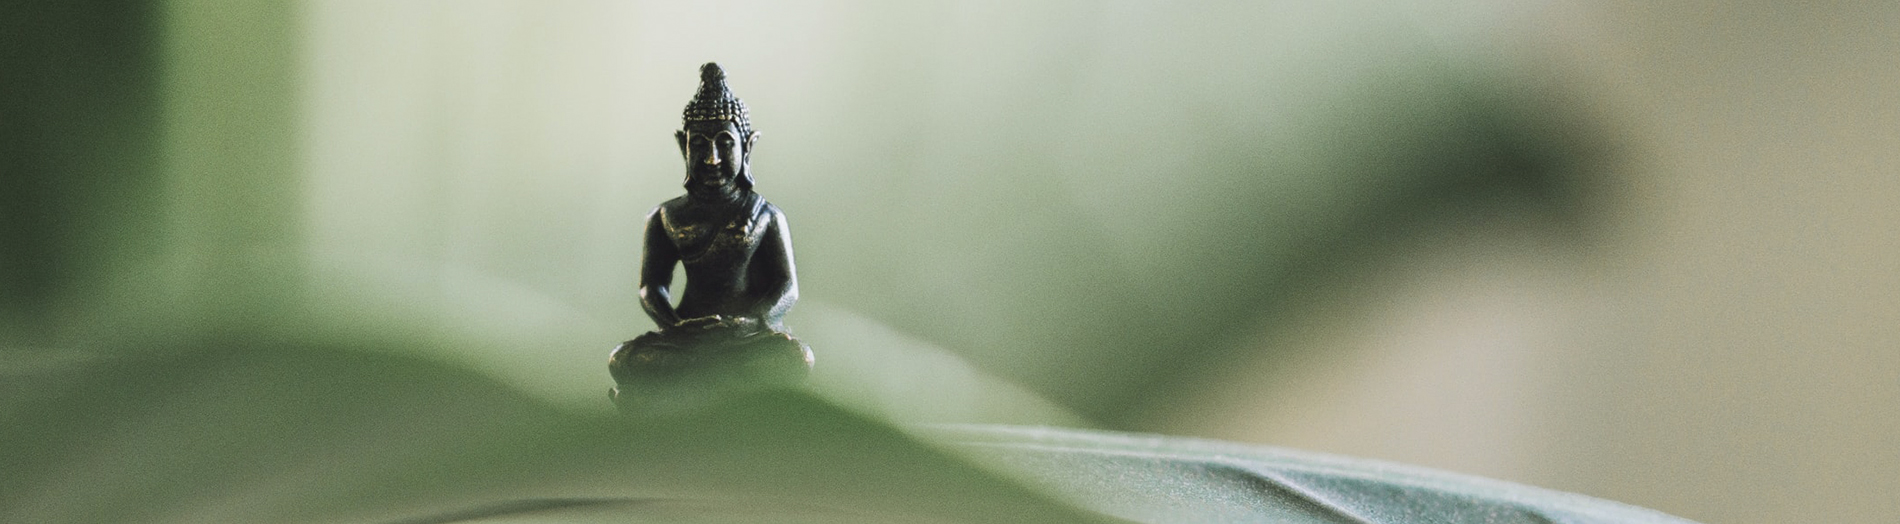 biid business yoga in graz